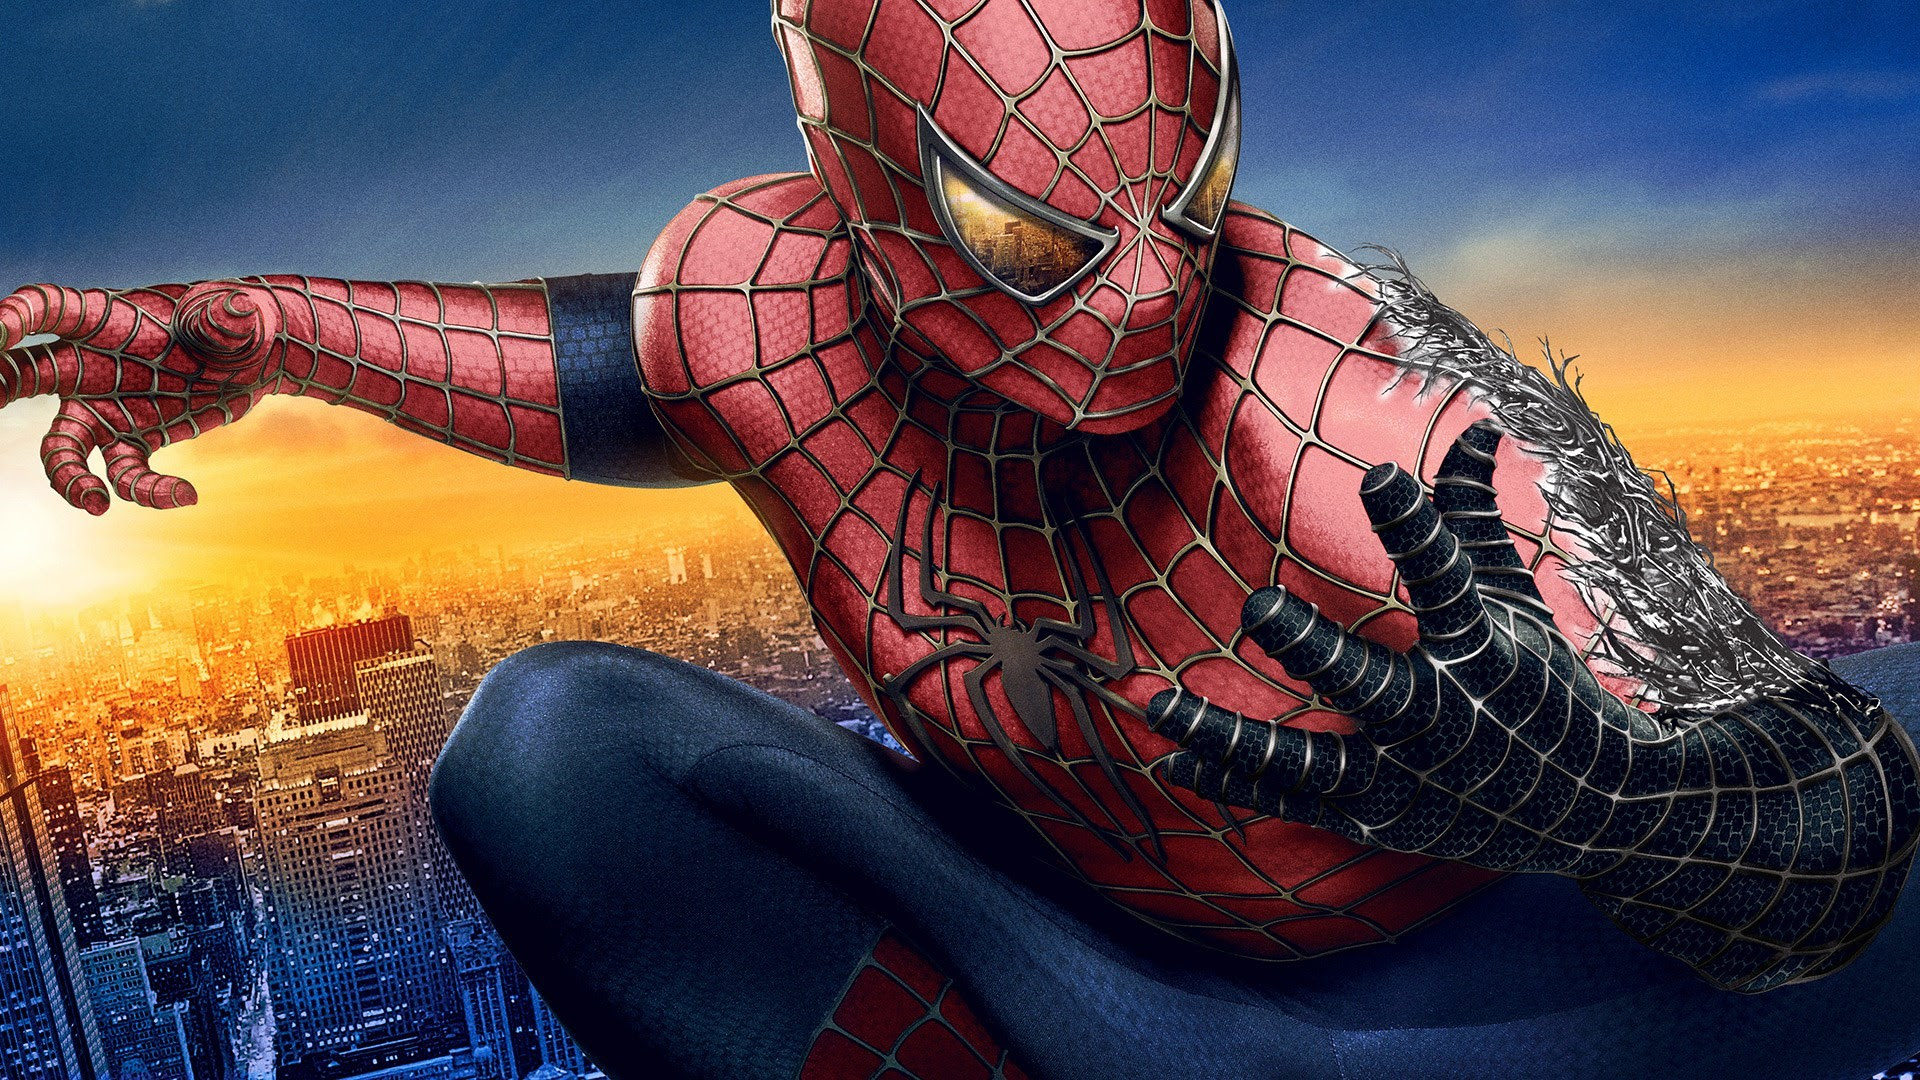 Spiderman 3 Images